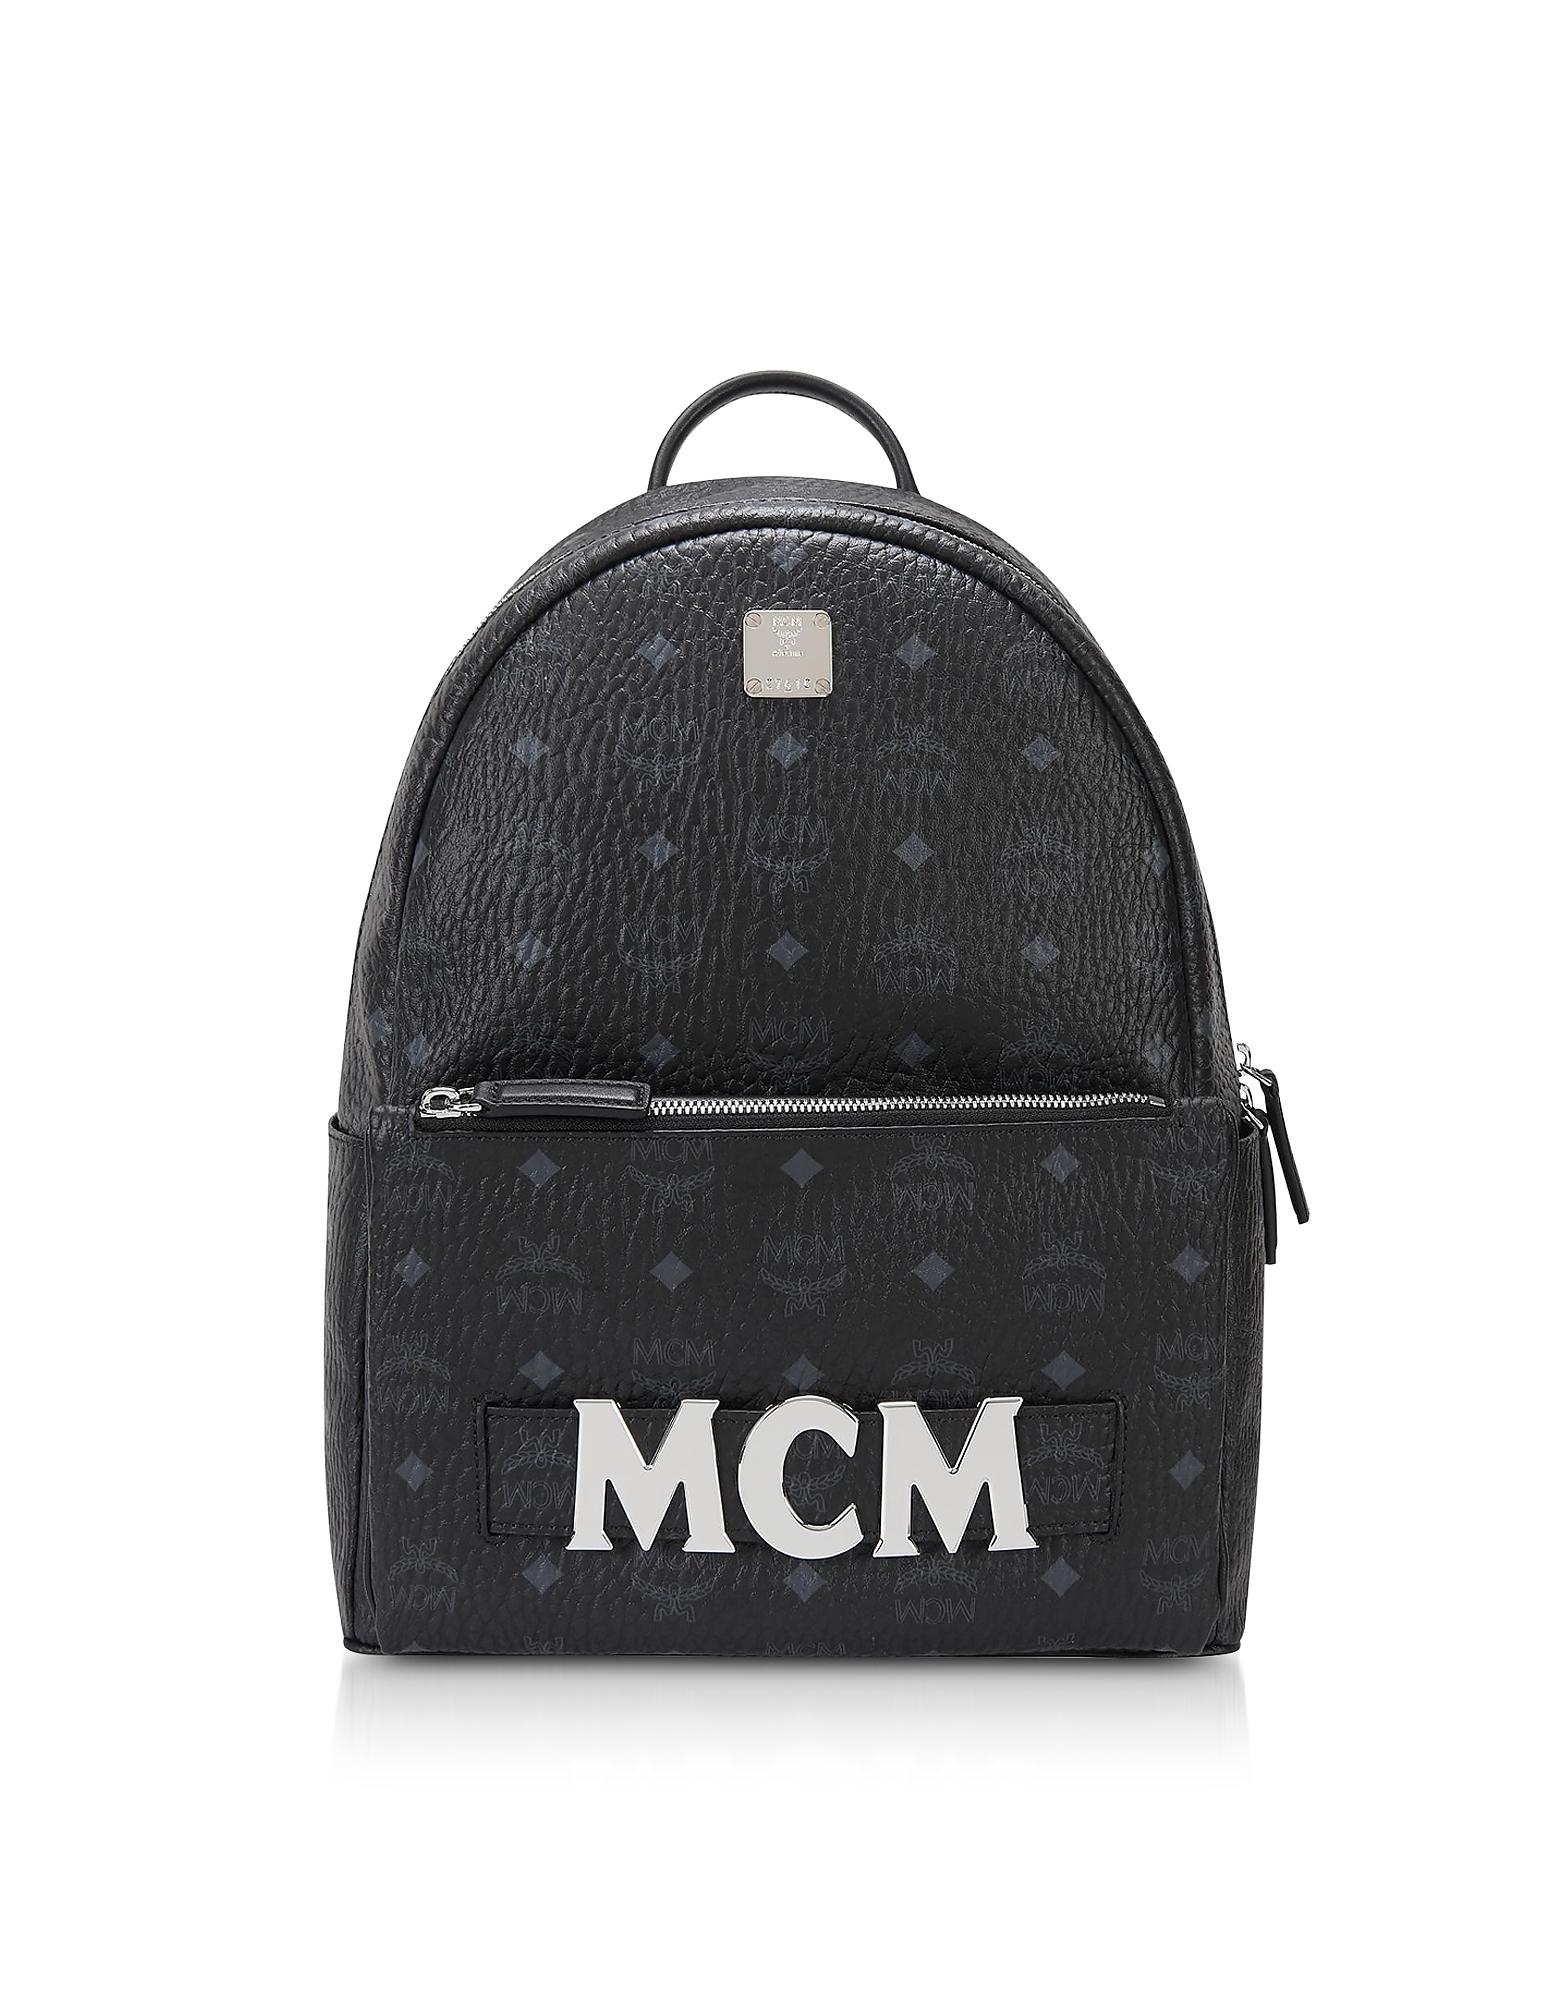 ae43cf5eb586e MCM Designer Handbags, Black Trilogie Stark Small/Medium Backpack. FORZIERI